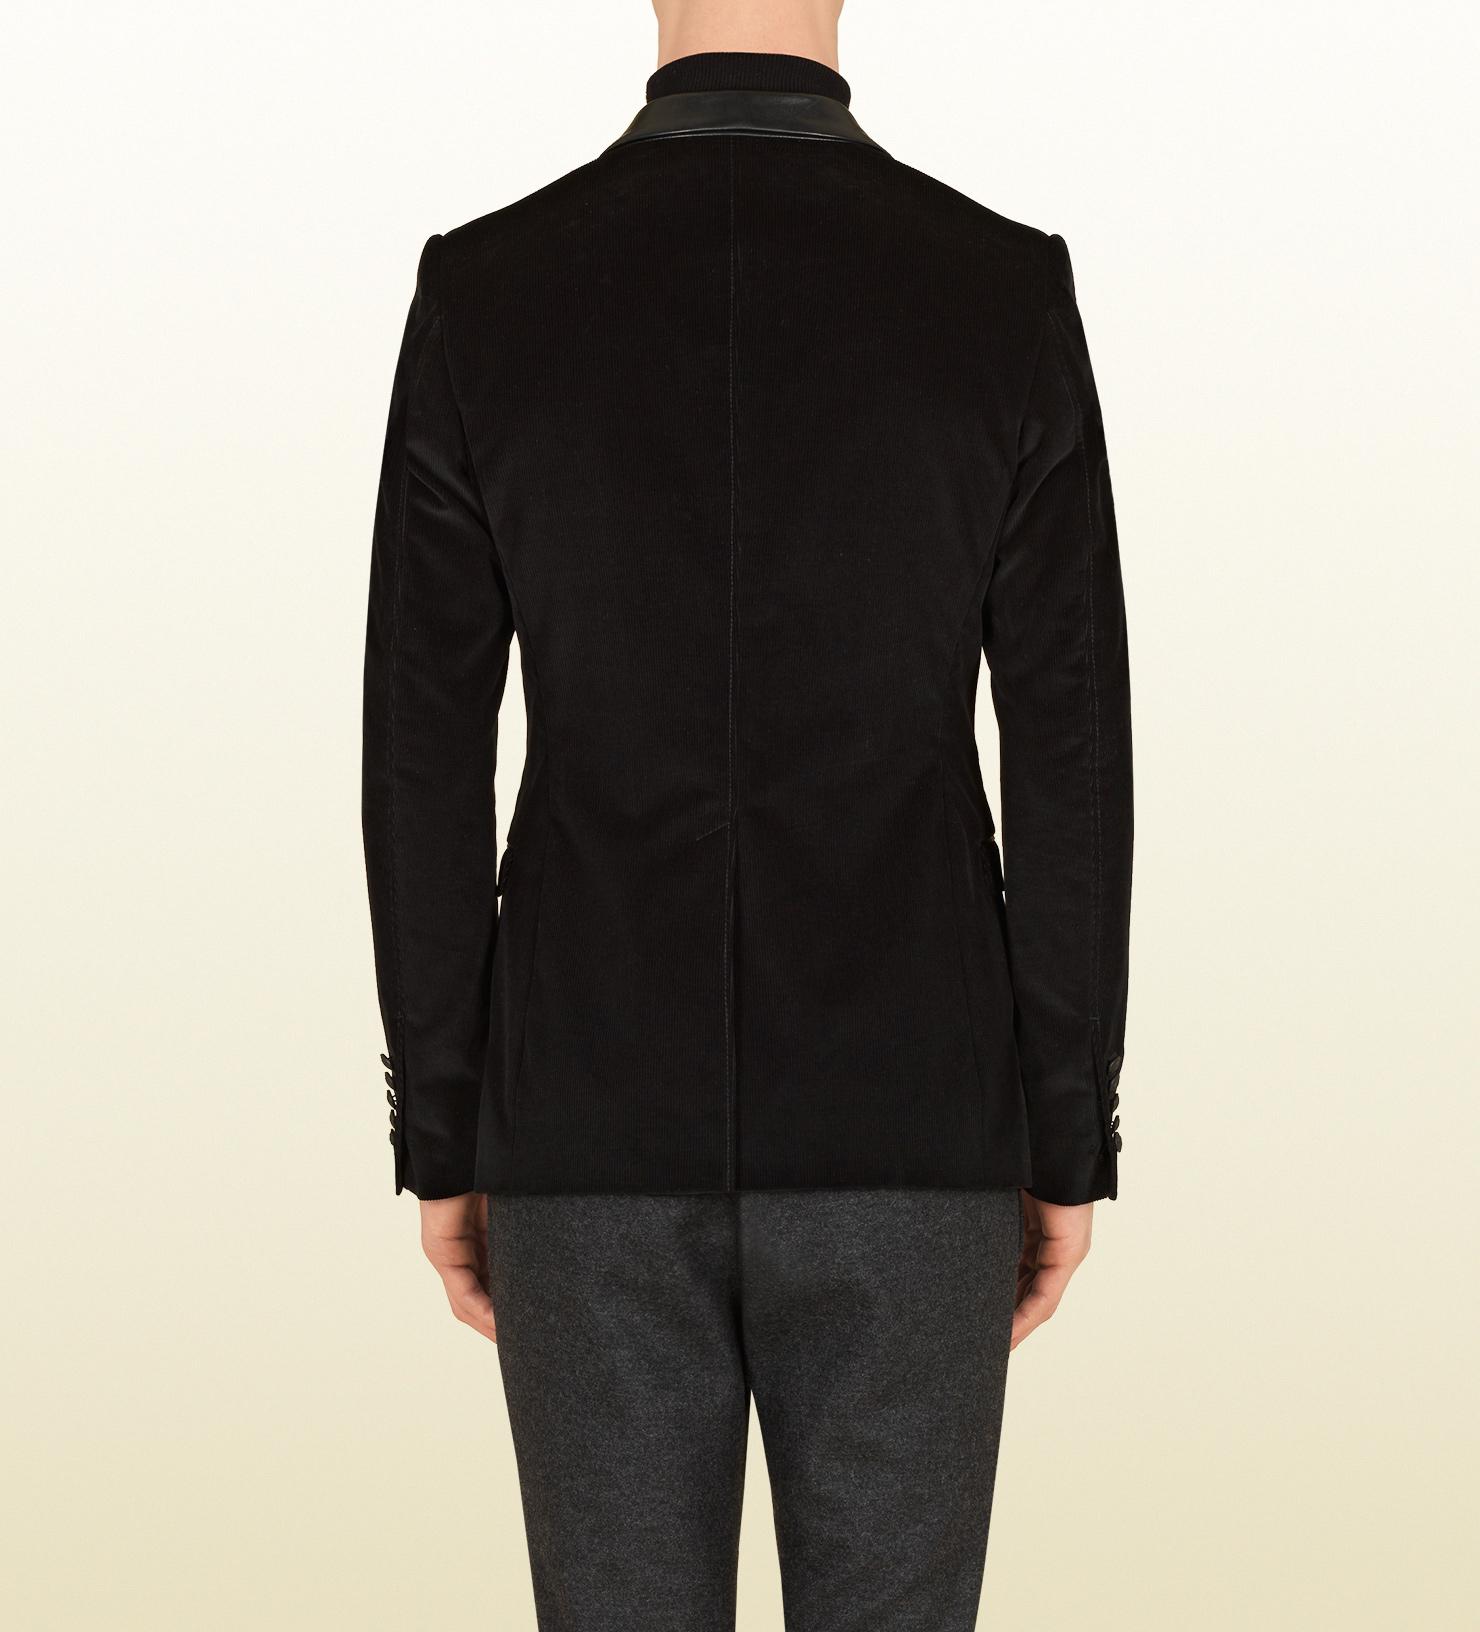 686ac97e0 Gucci Black Corduroy Dylan 60's Jacket in Black for Men - Lyst